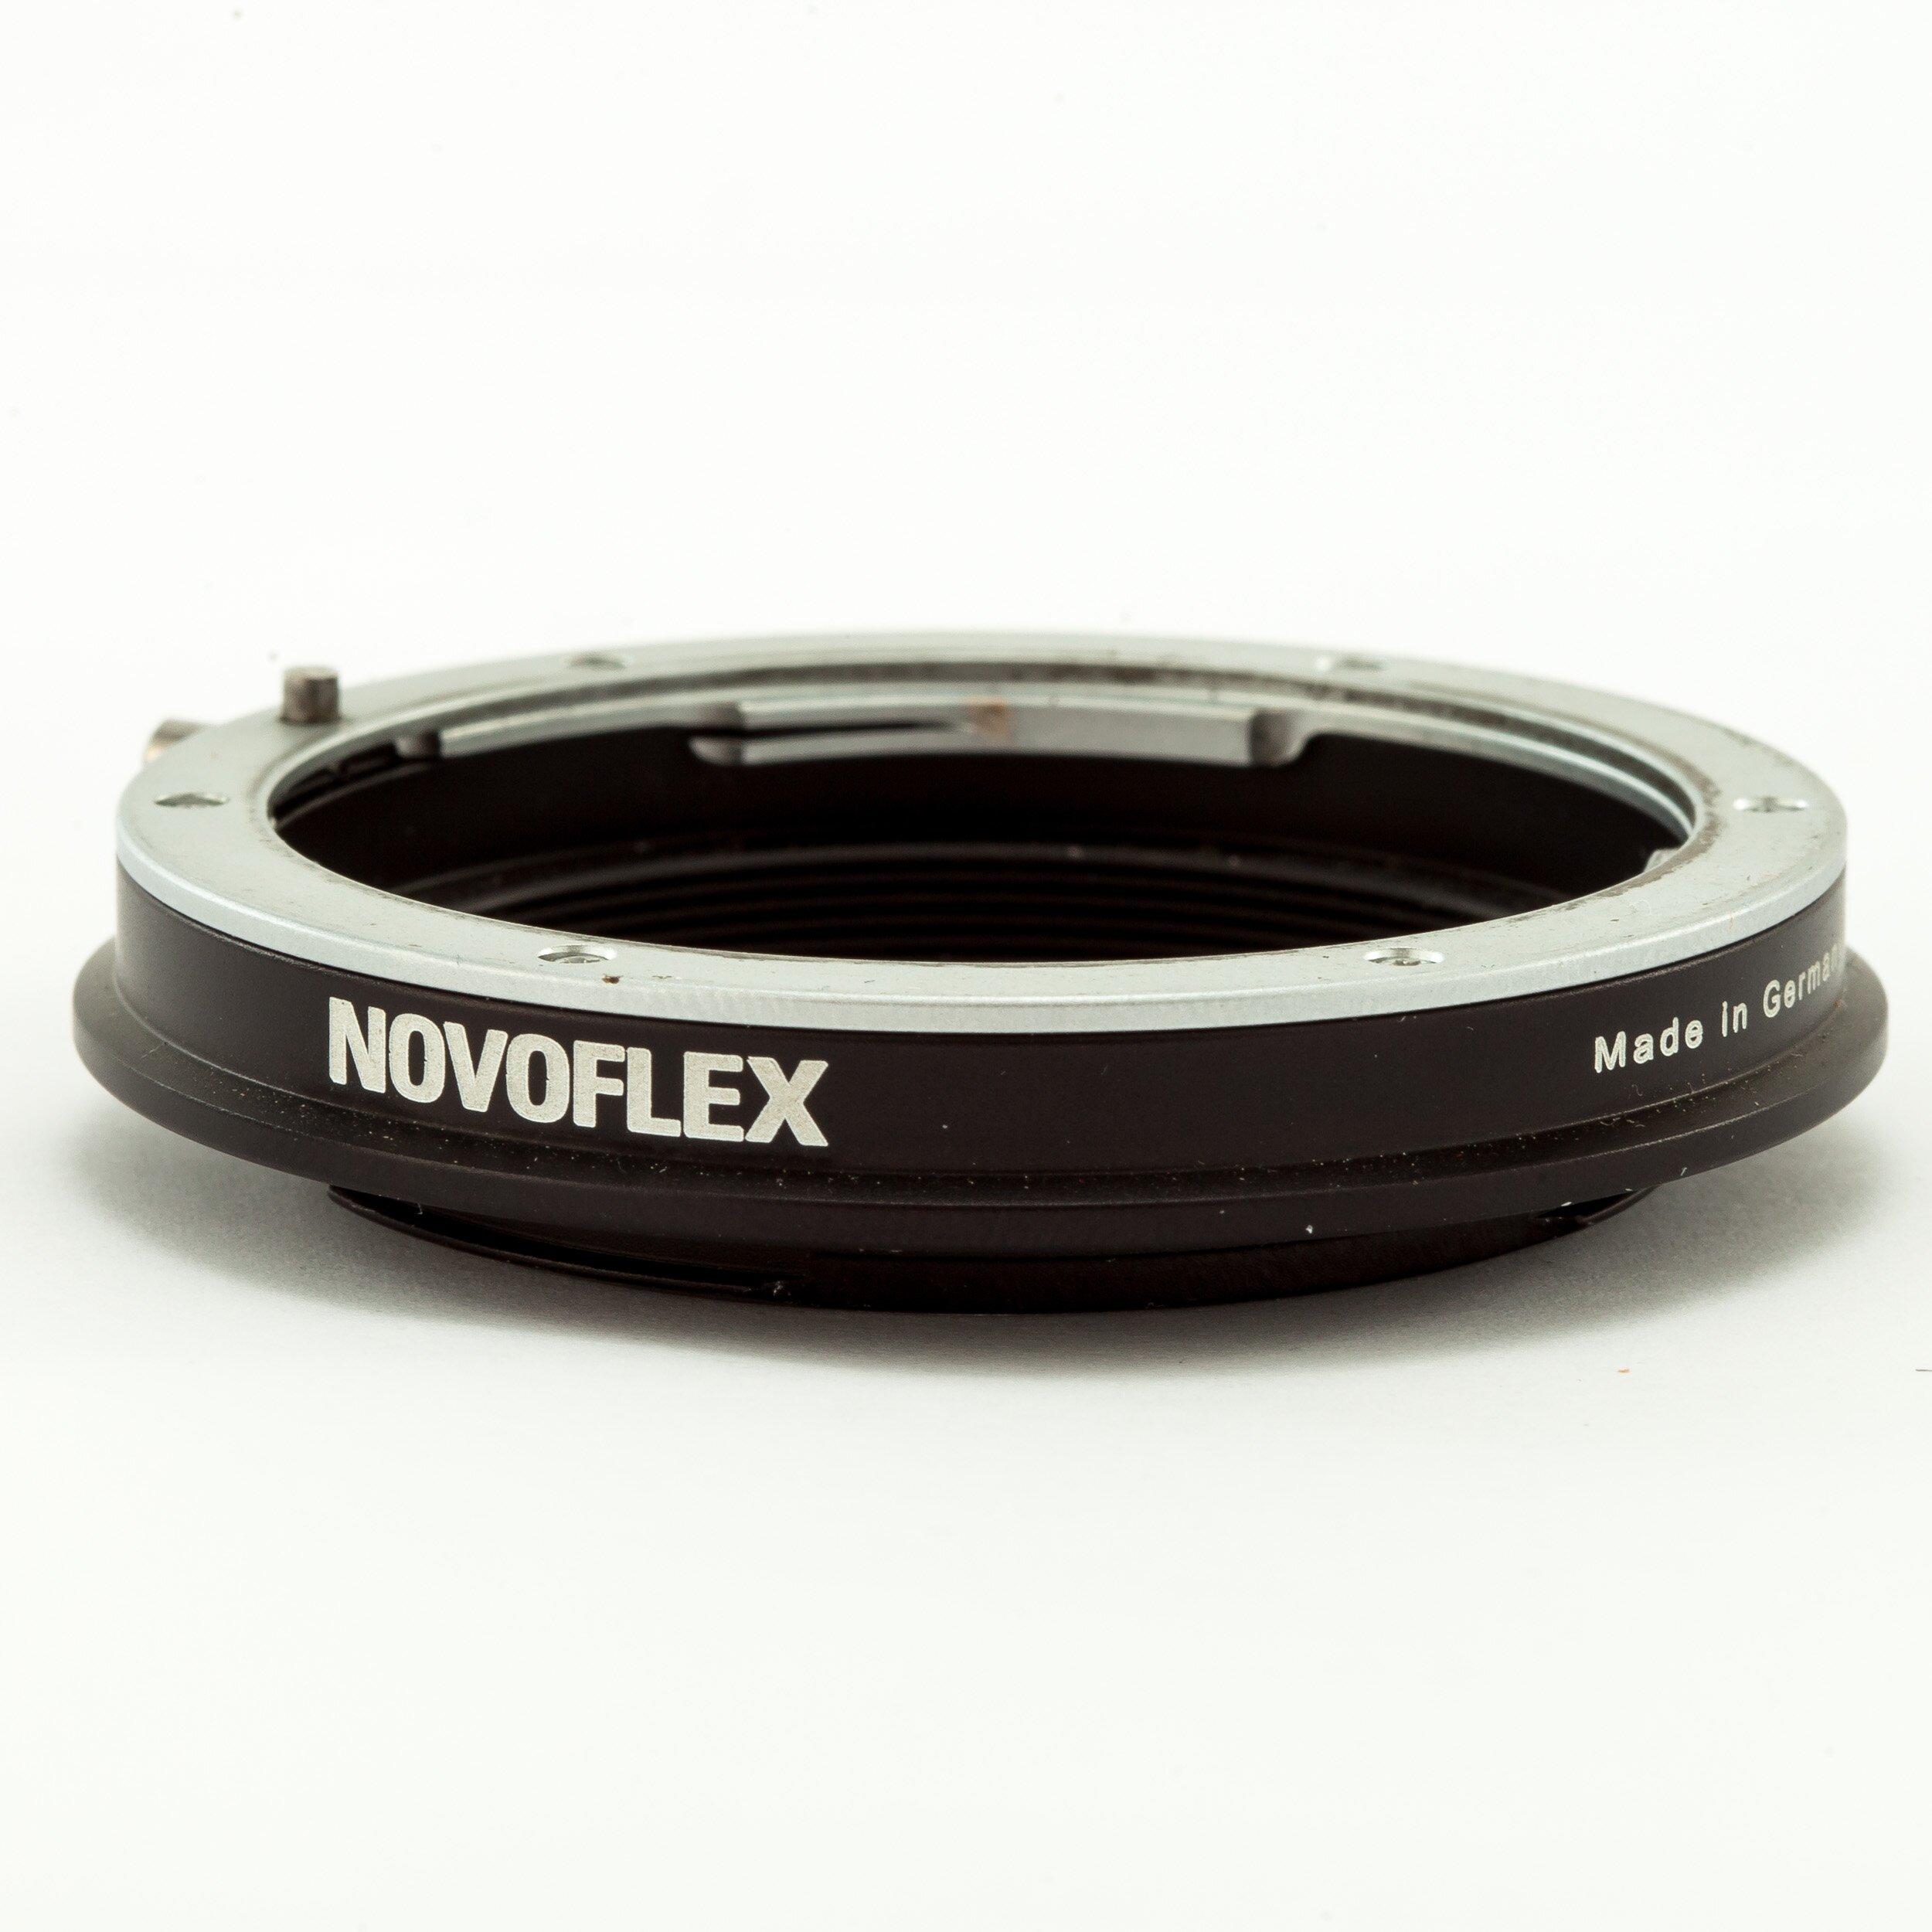 Novoflex FT/Nik Adapter